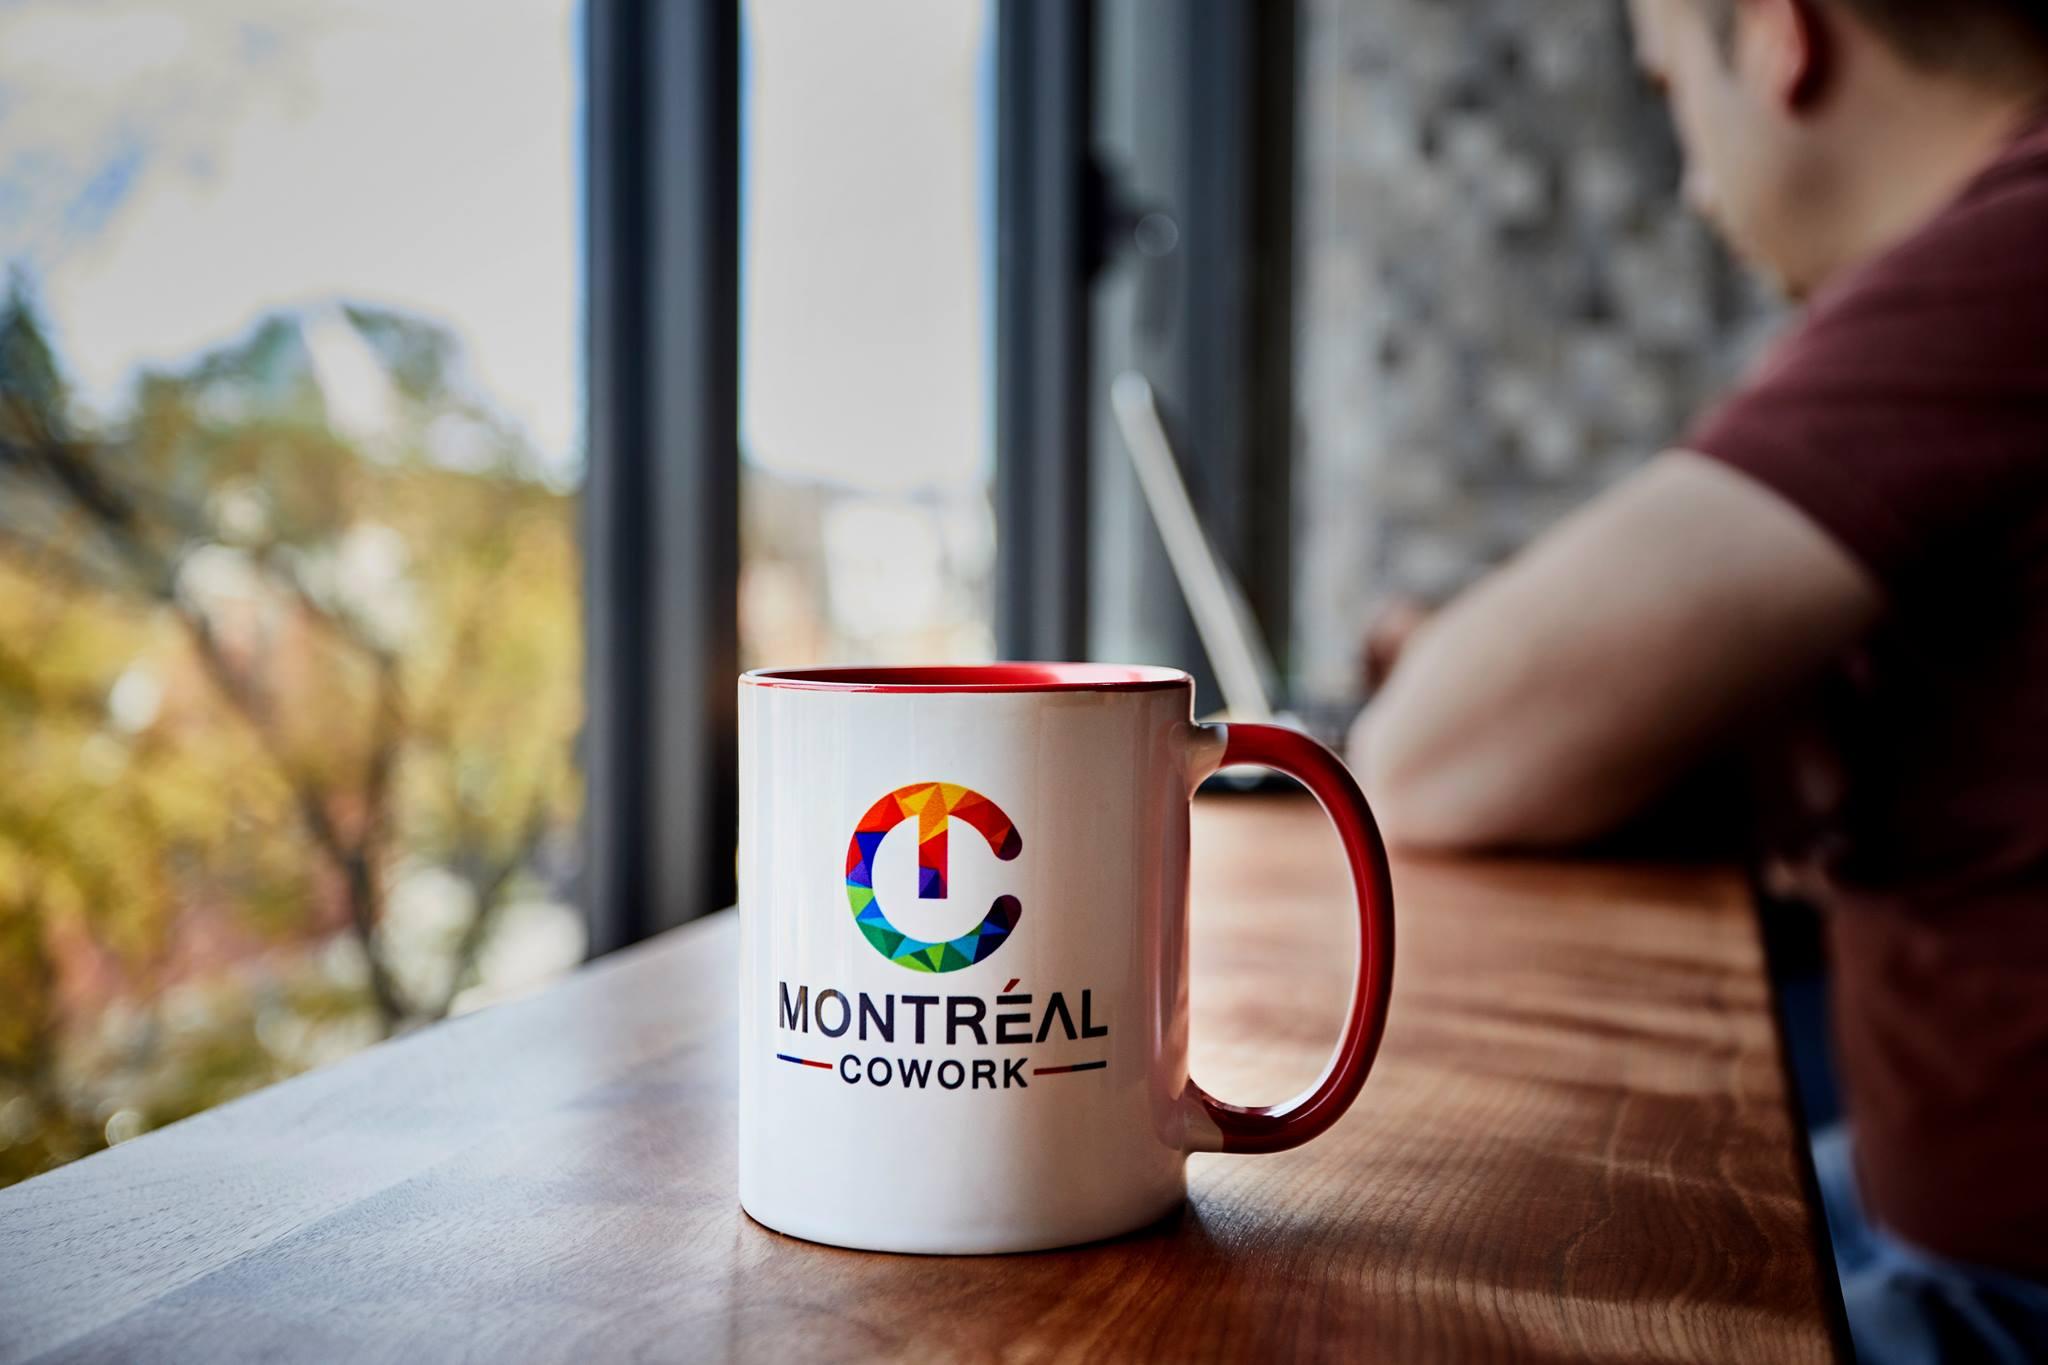 Montréal Cowork, Montreal